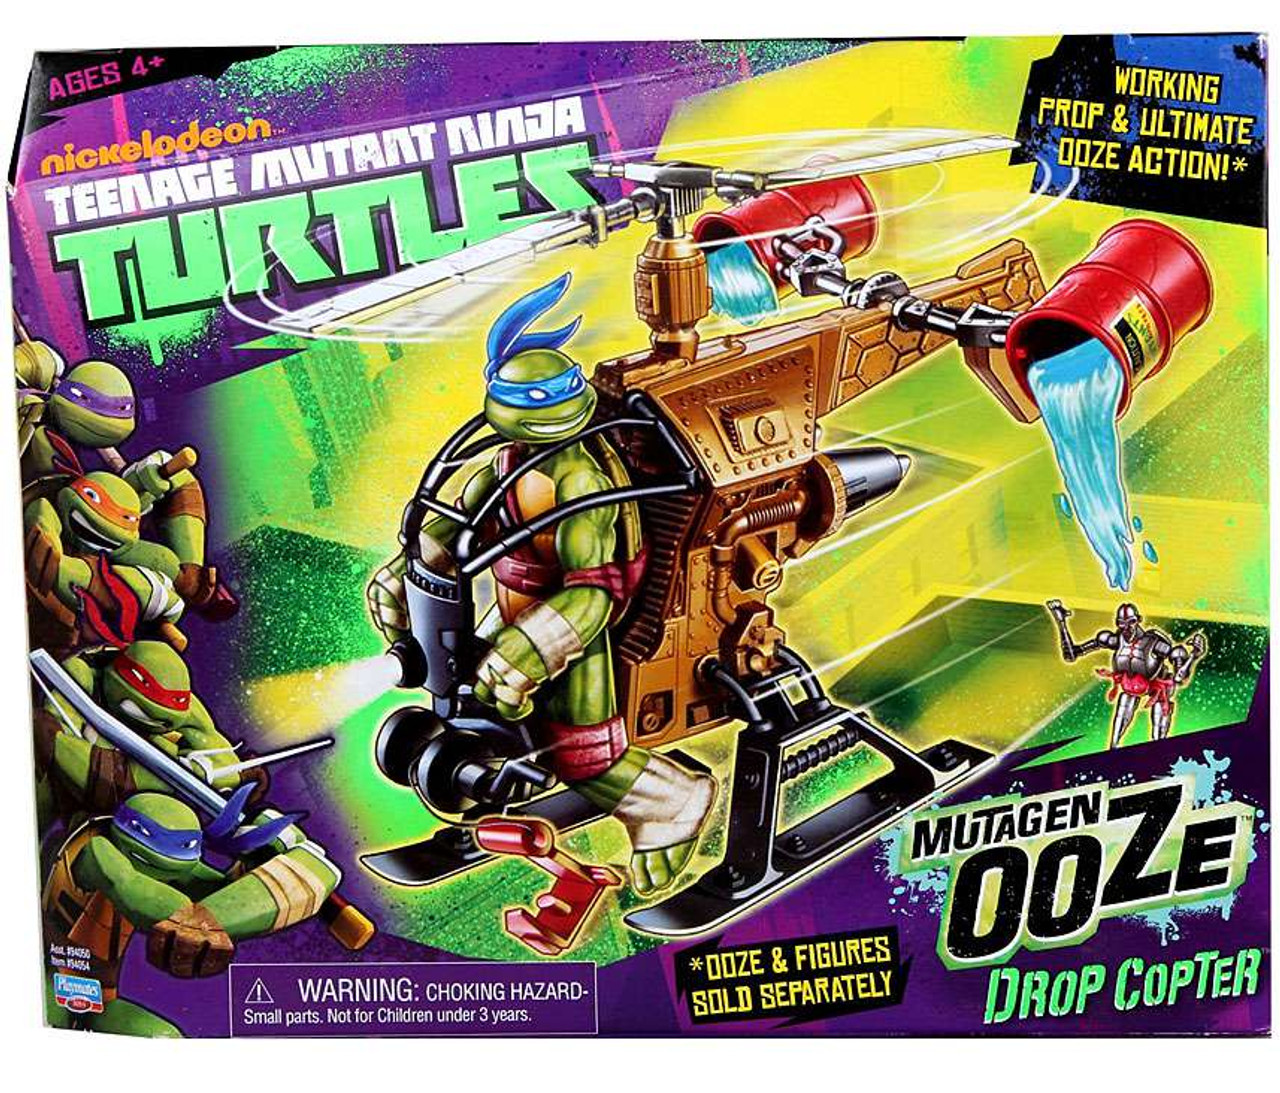 Teenage Mutant Ninja Turtles Nickelodeon Mutagen Ooze Drop Copter Action Figure Vehicle